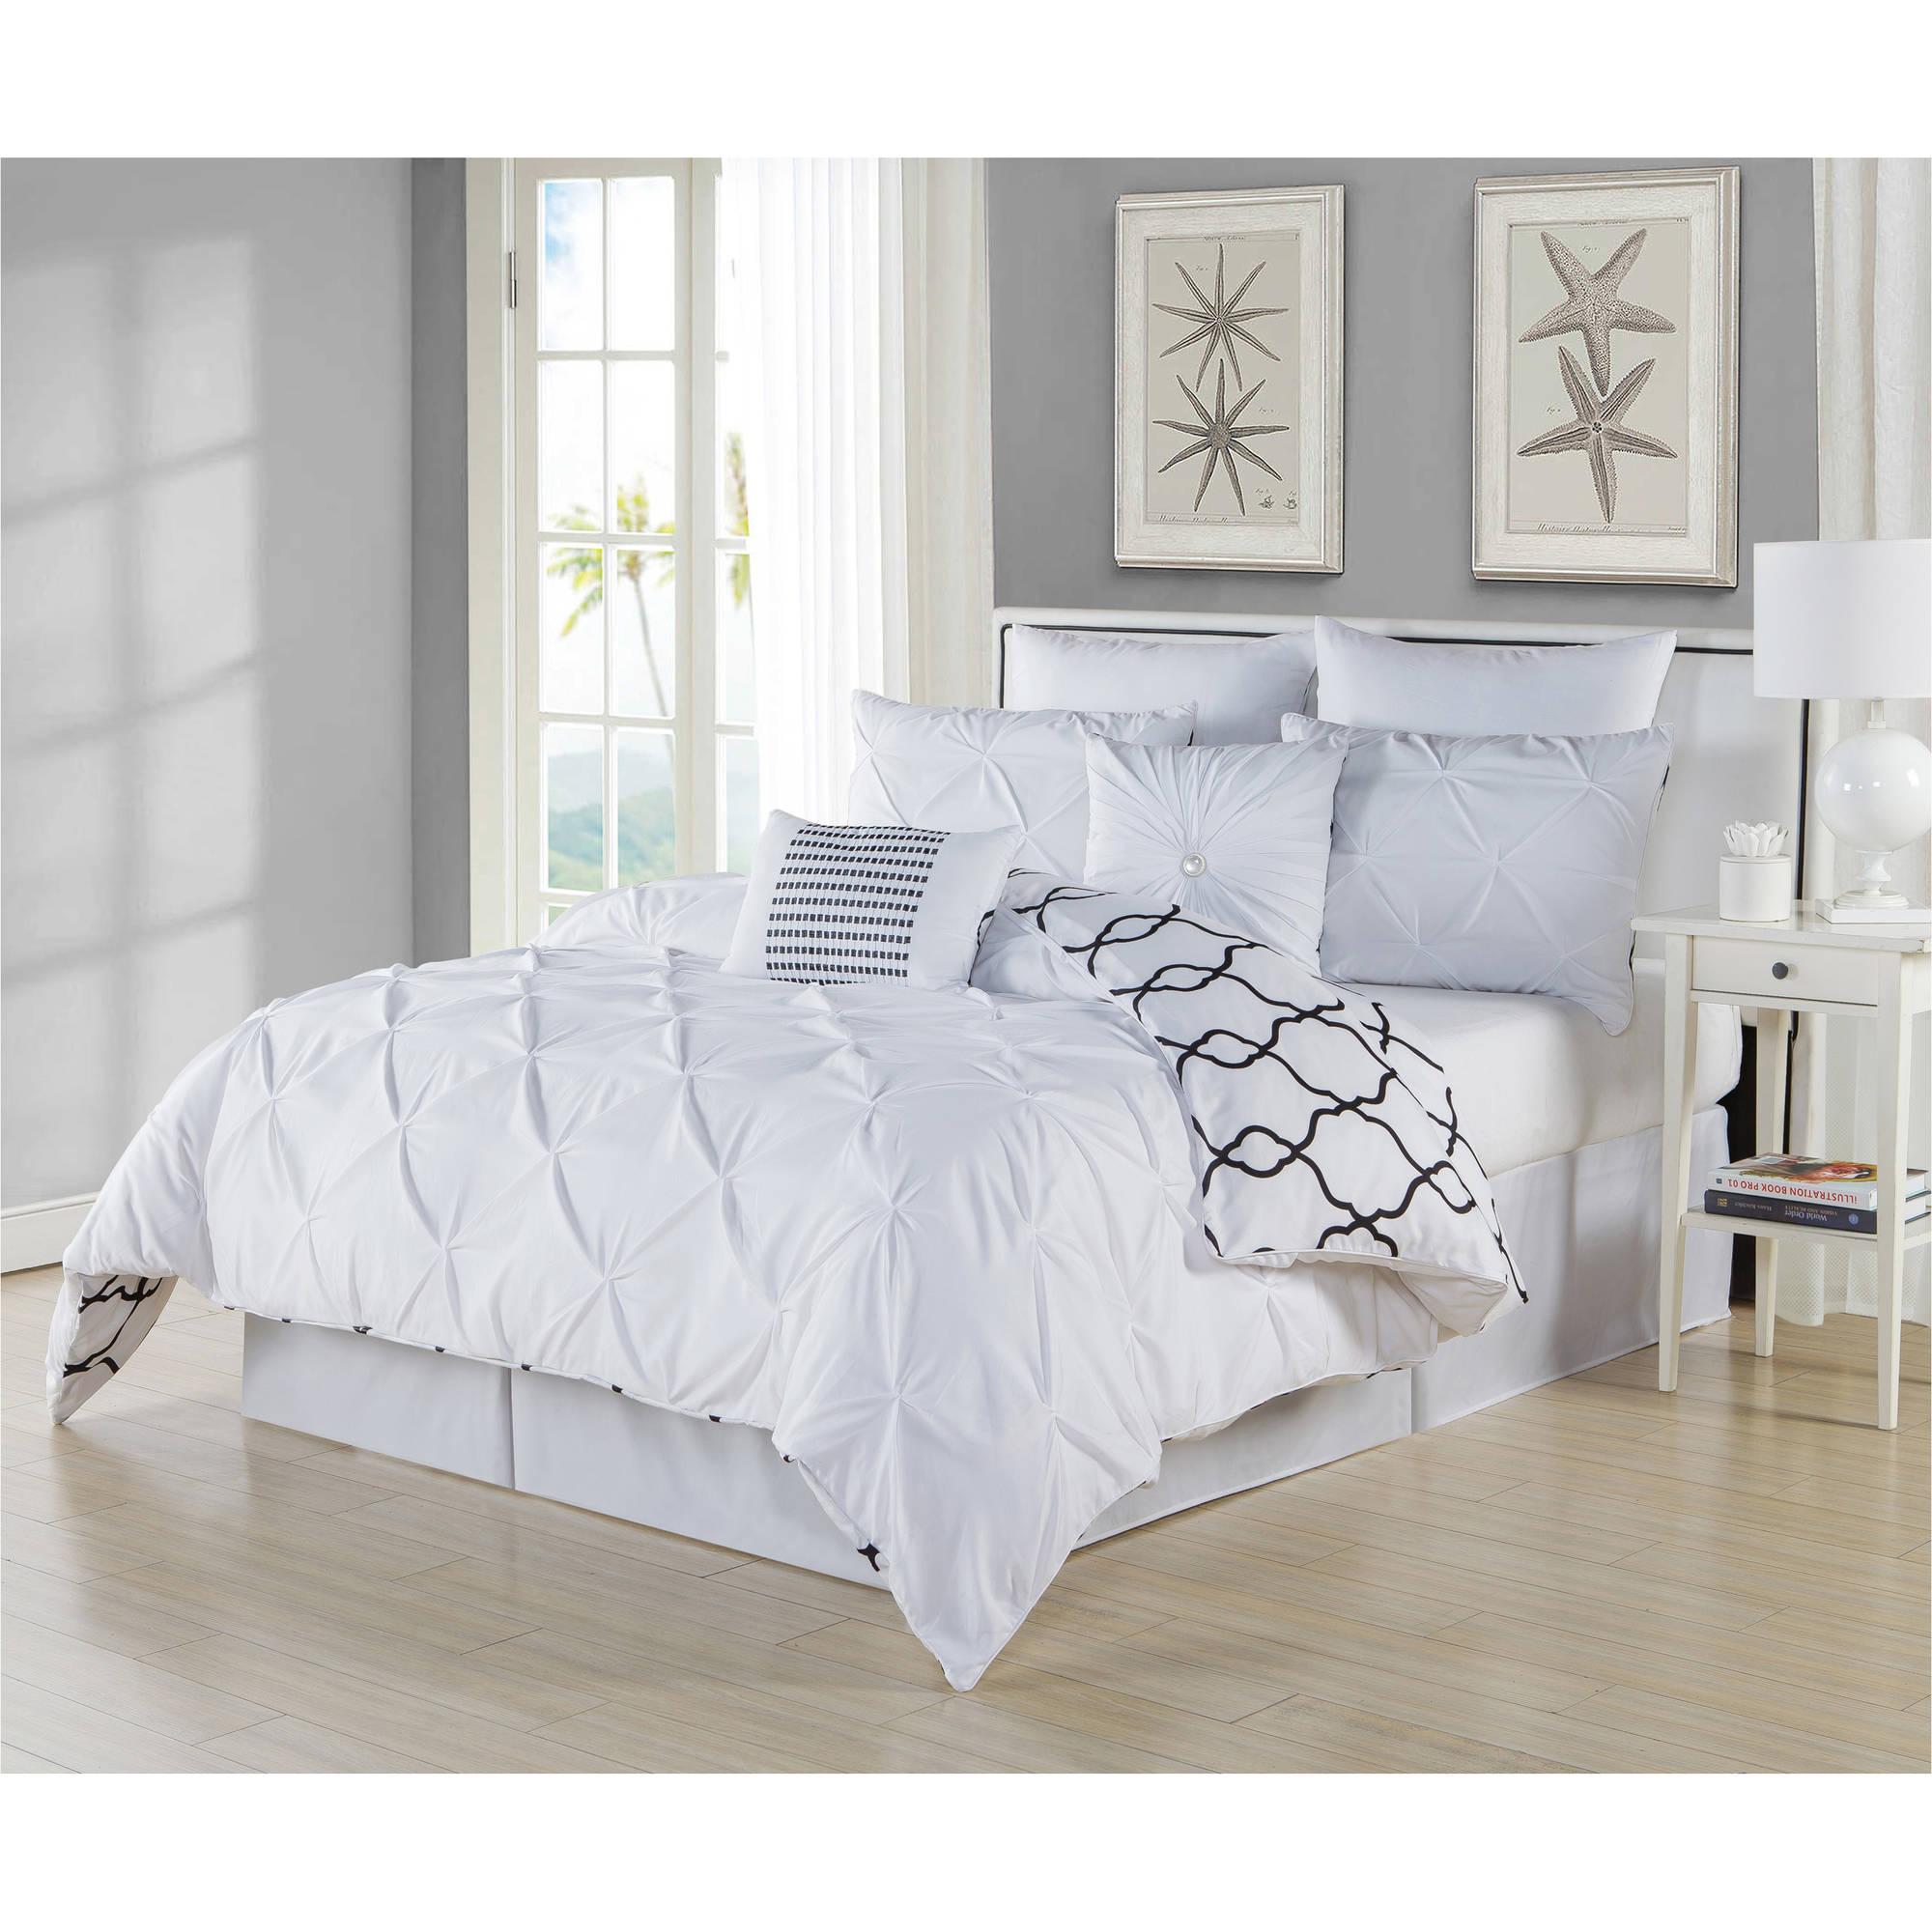 Esy Reversible 8 Piece King Comforter Set in White